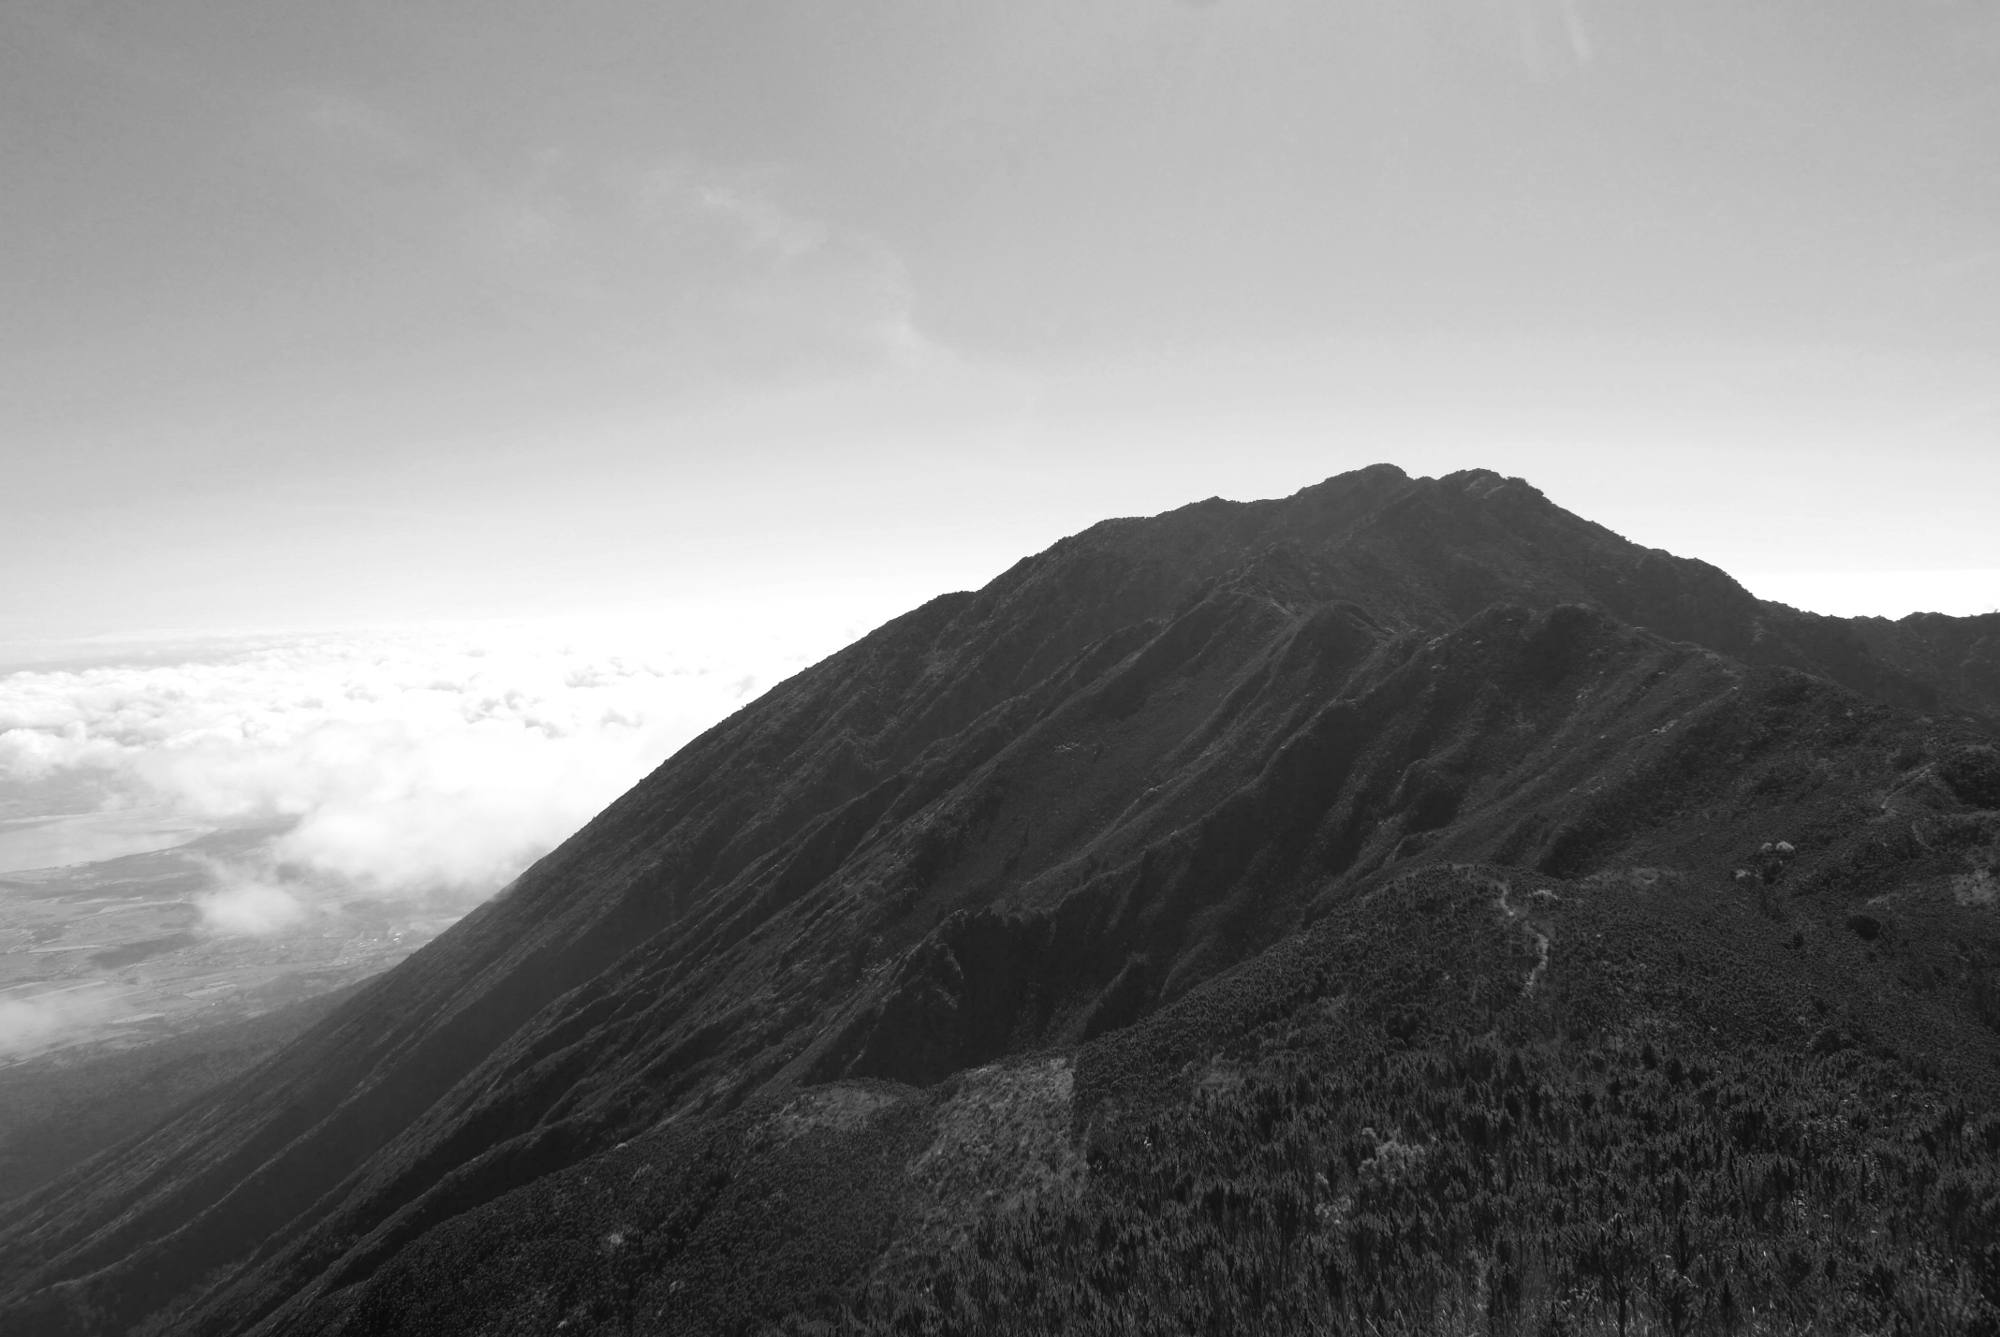 Mt. Hanang slopes